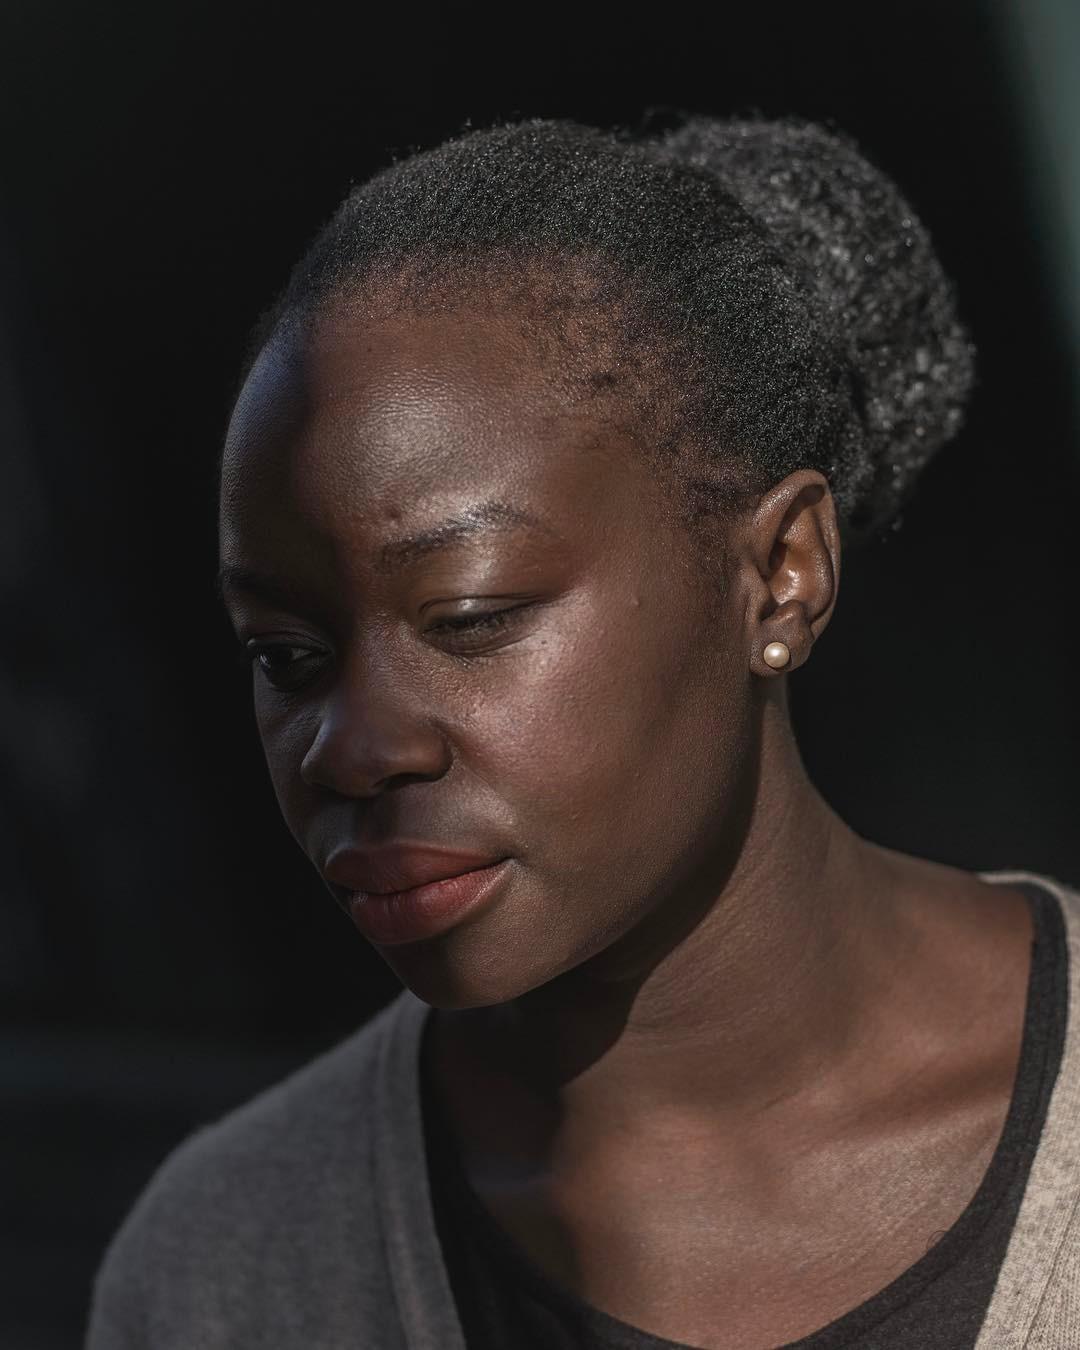 Mary Consolata Namagambe from @uvudk for @murmur.dk